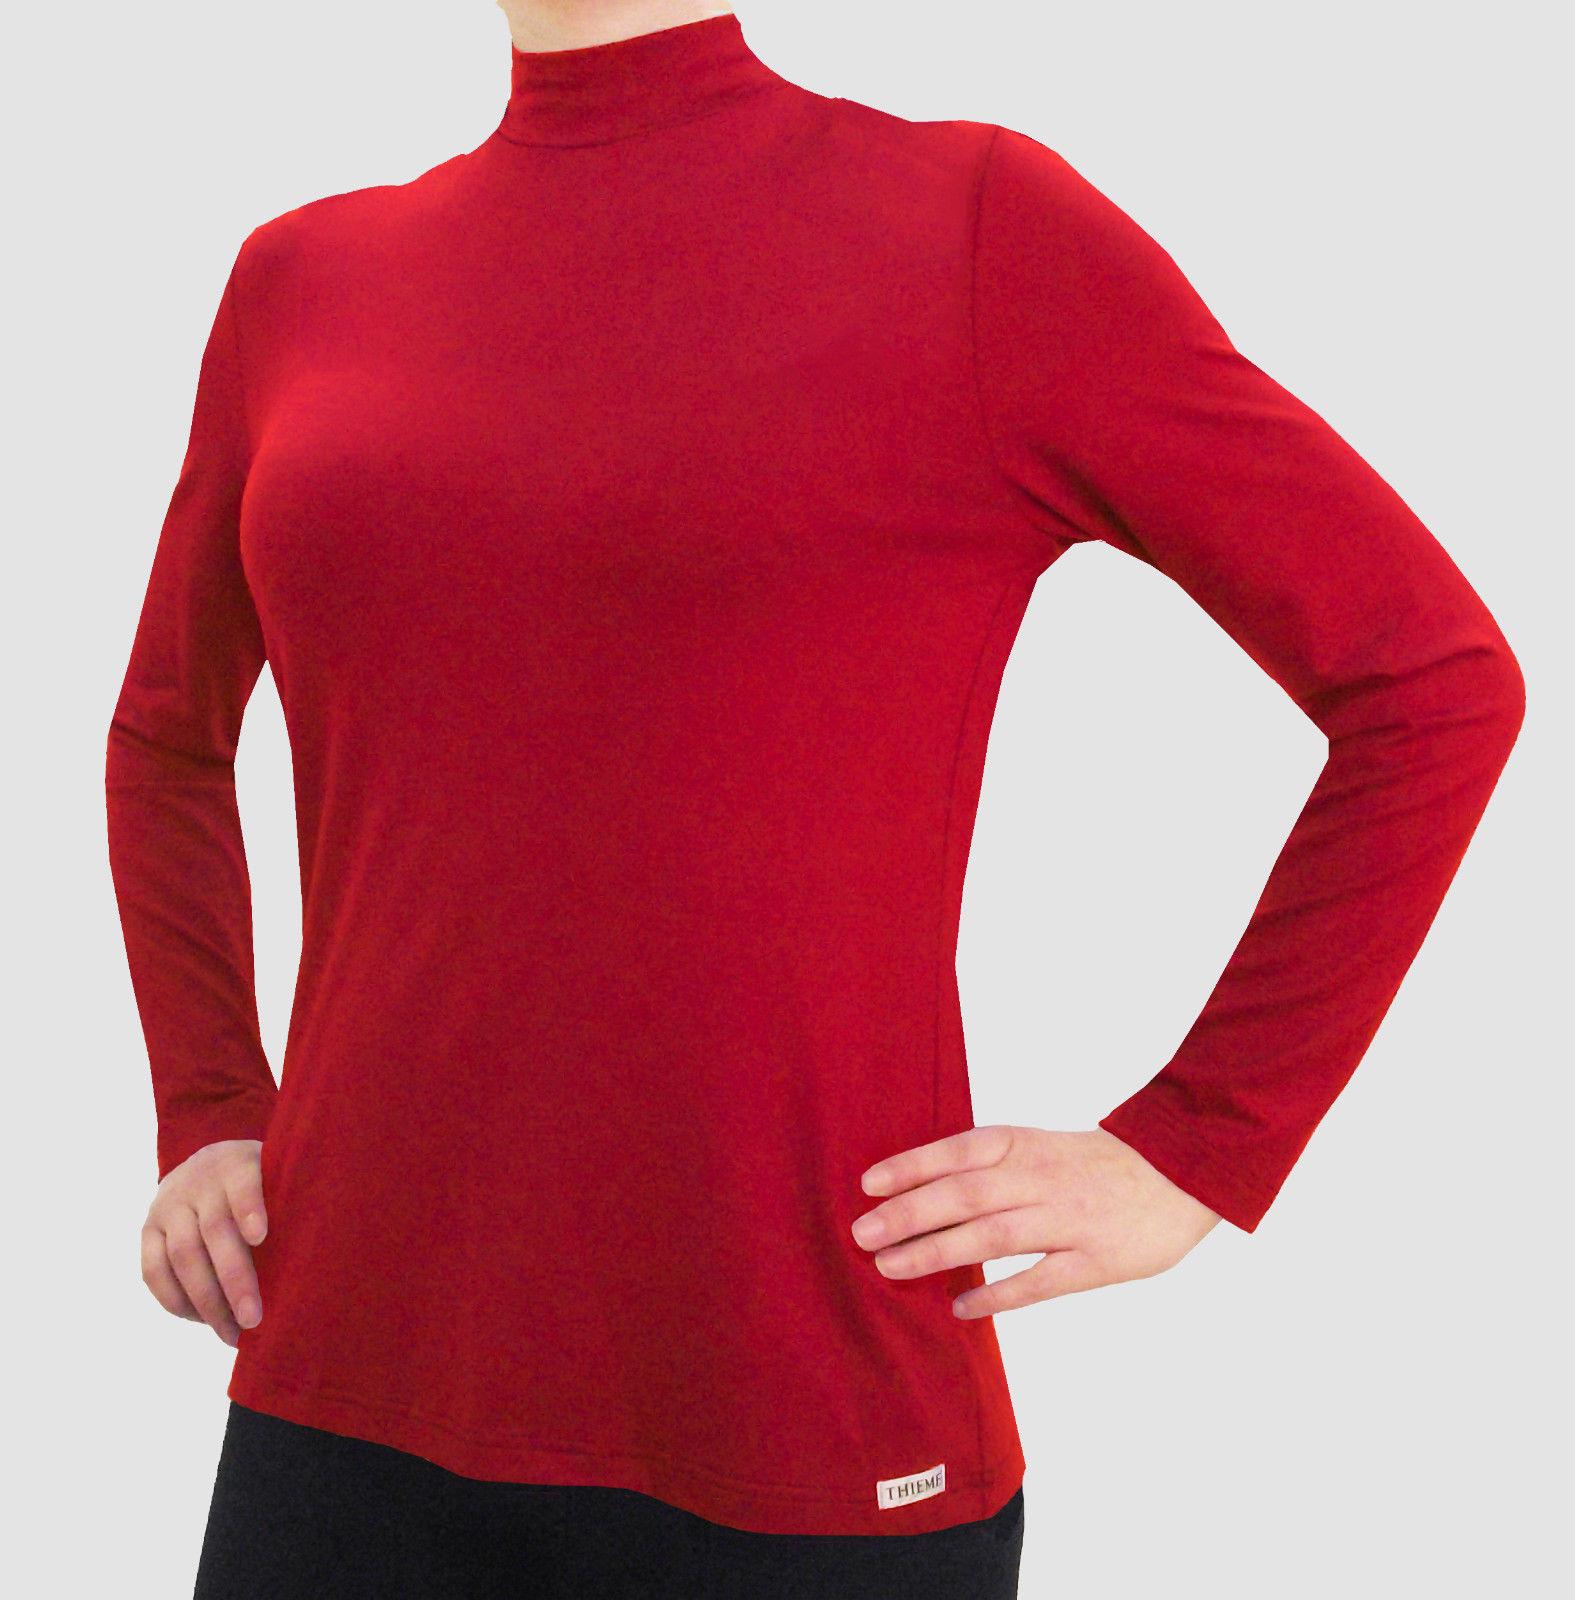 98aeae0ceca382 Longshirts Langarm Shirts Damen   THIEME Fashion Shop